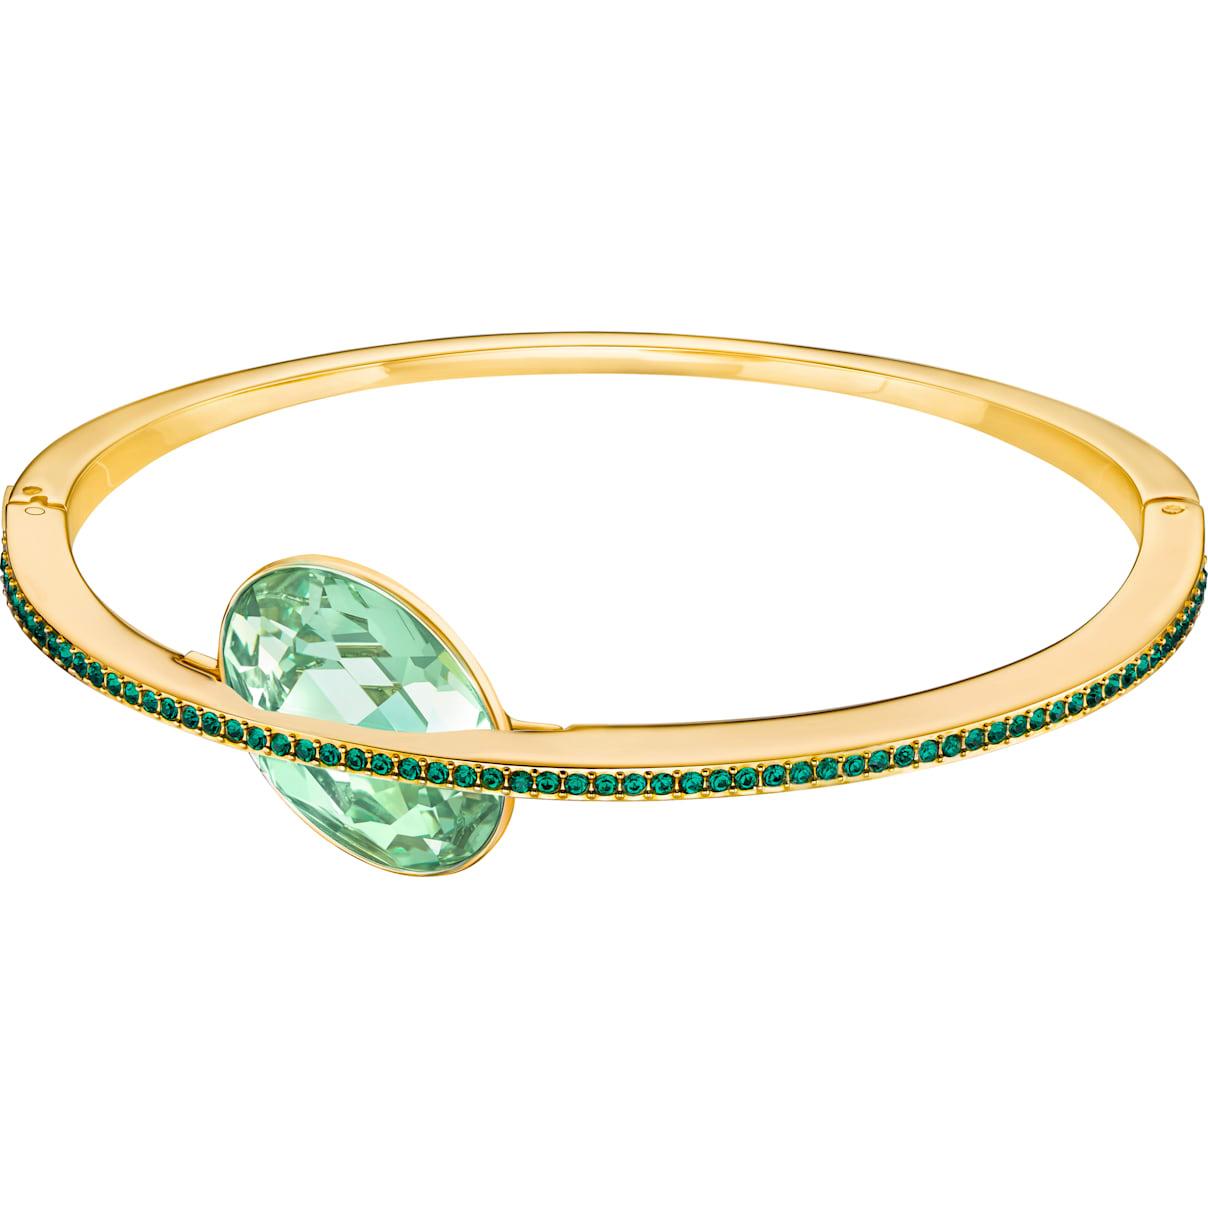 Swarovski Land of Hope Bangle, Green, Gold-tone plated